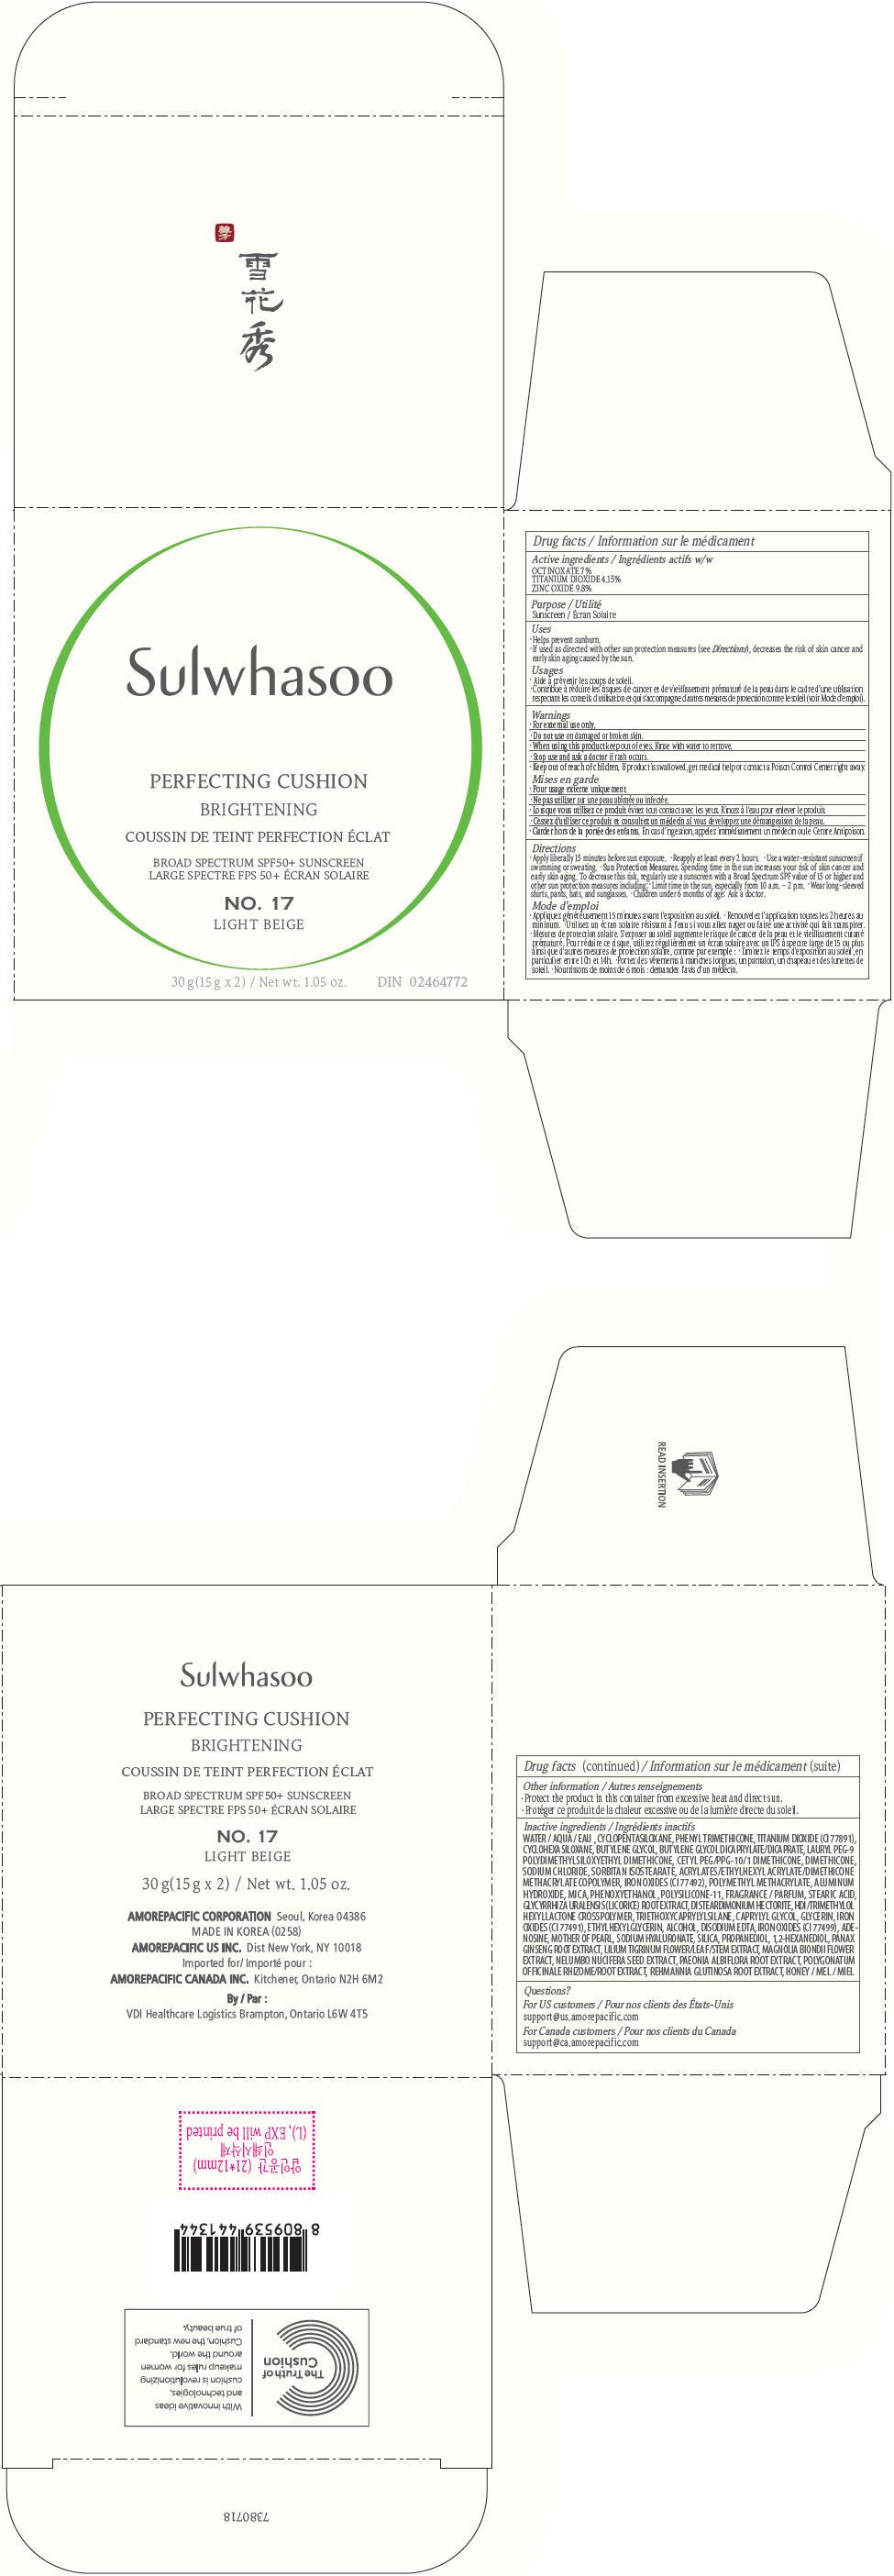 PRINCIPAL DISPLAY PANEL - 30 g Container Carton - NO. 17 LIGHT BEIGE